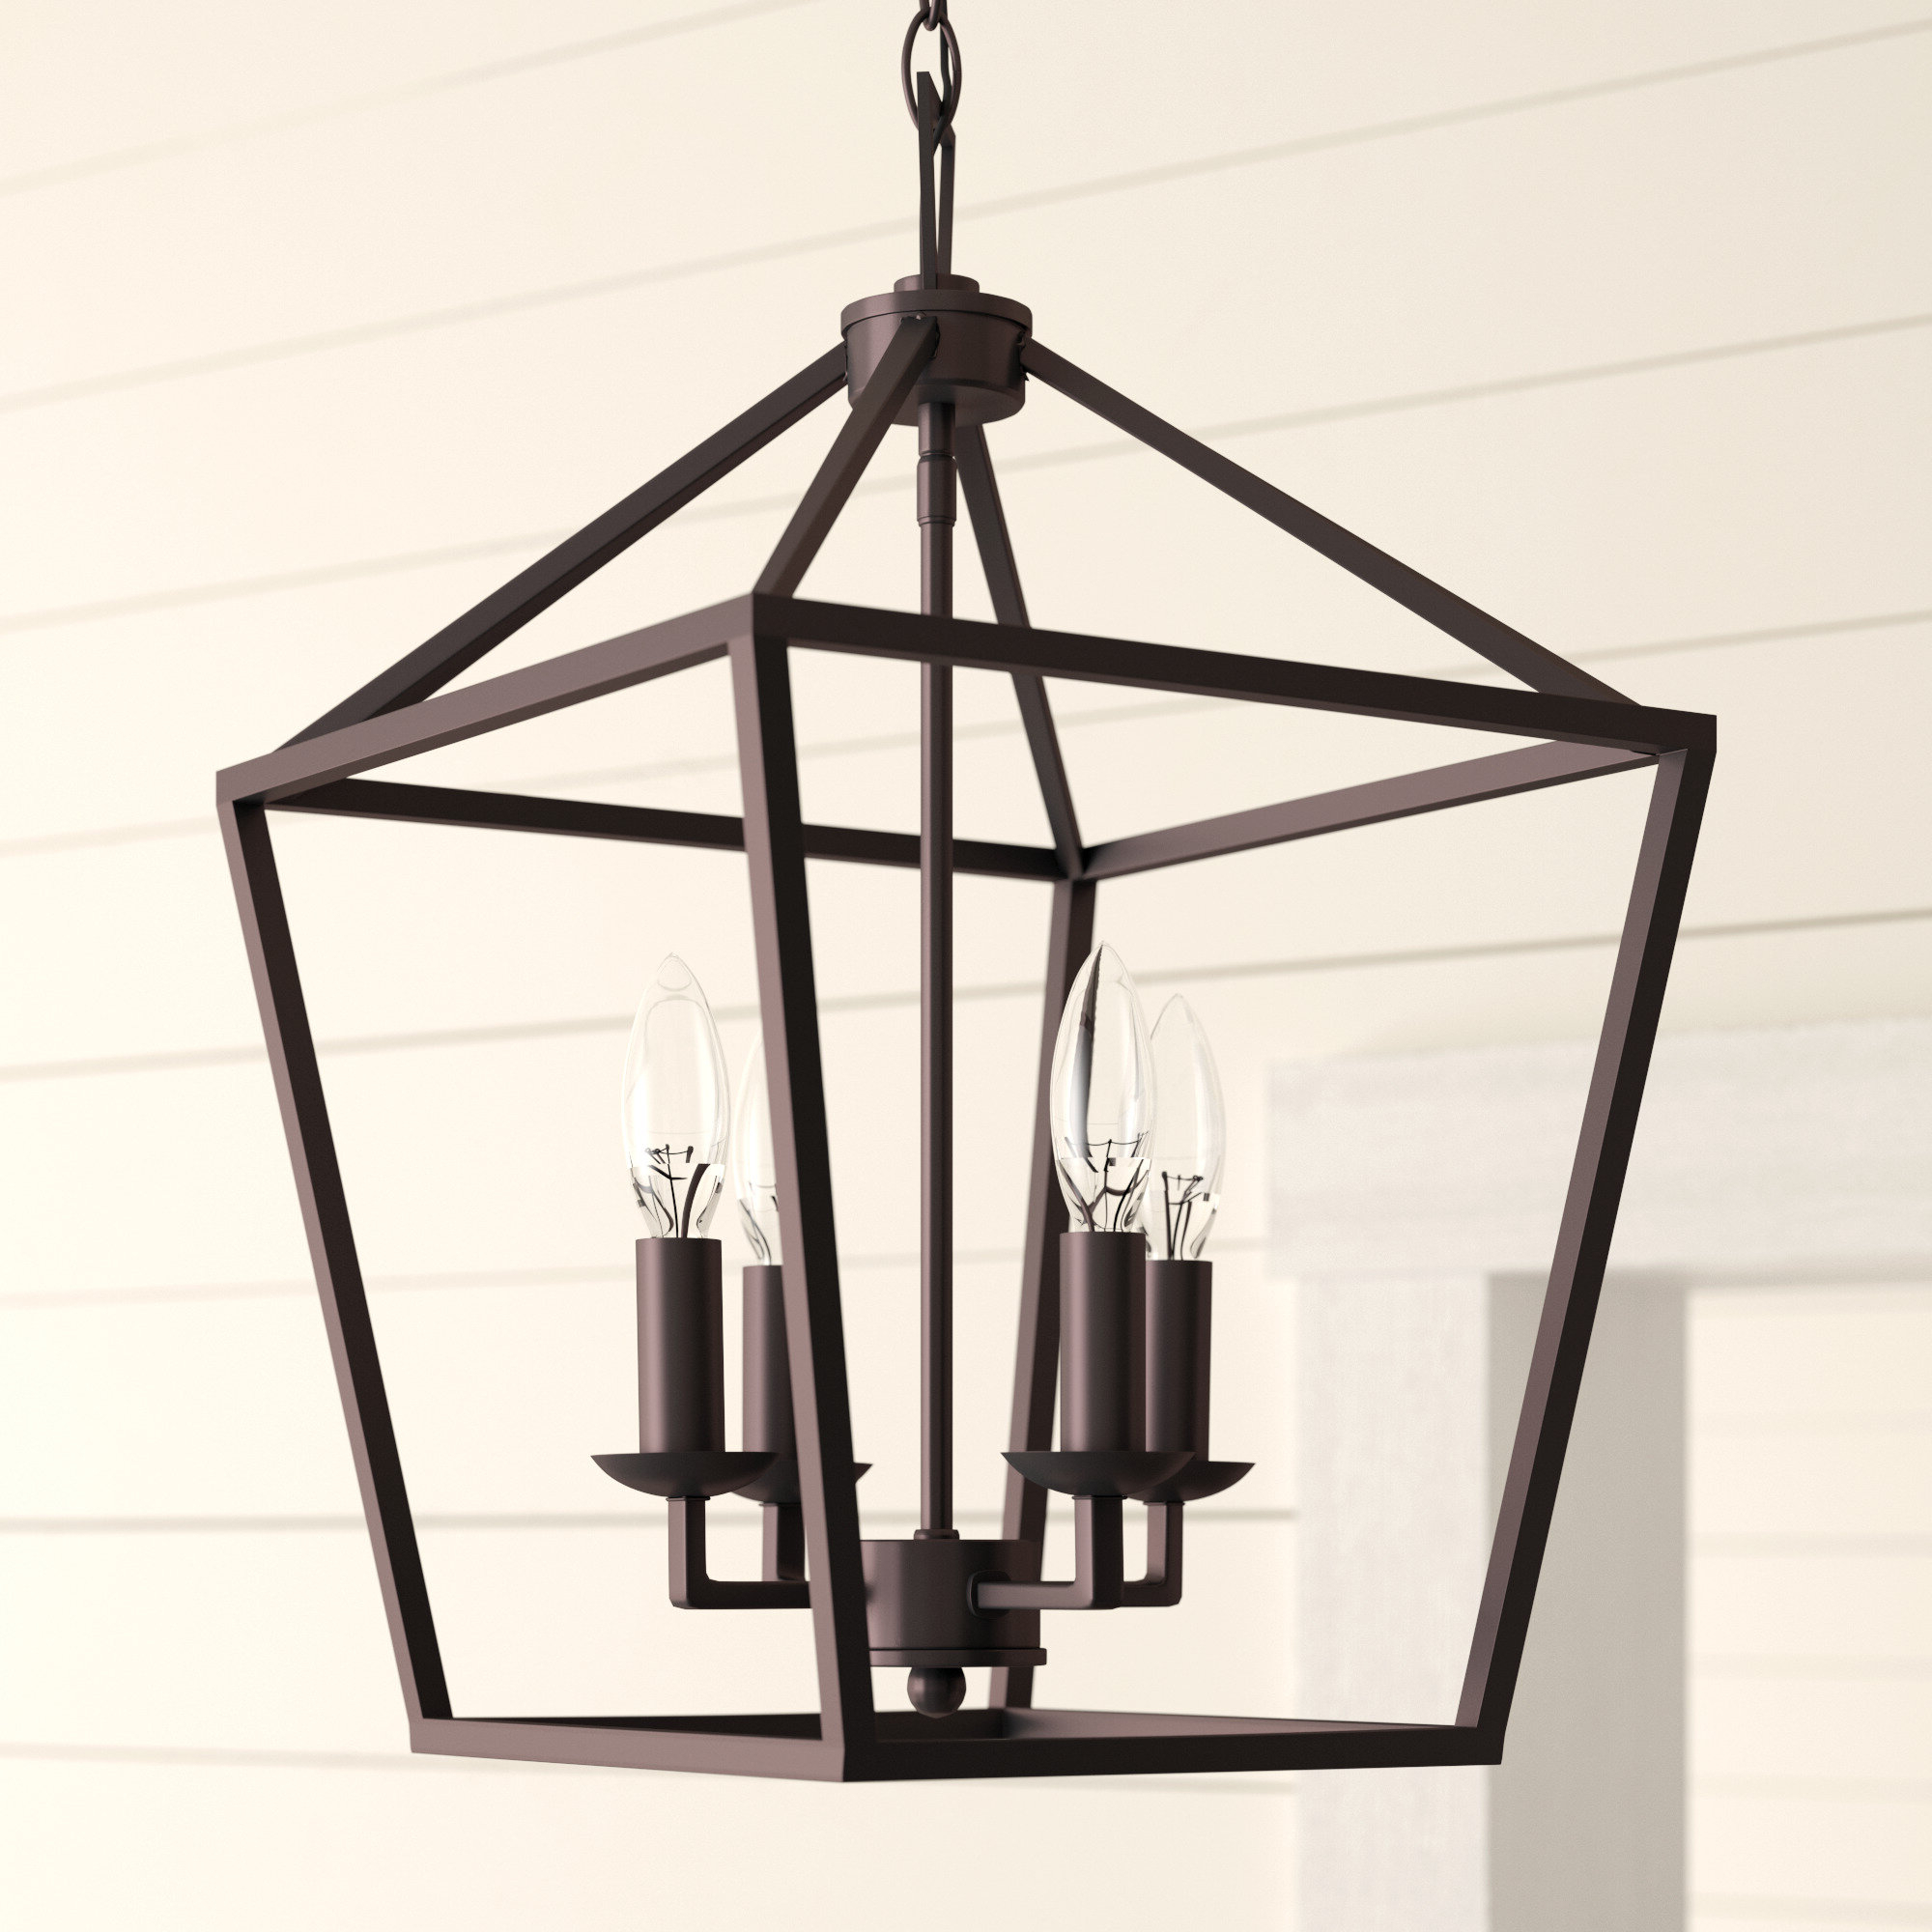 Most Recently Released Carmen 4 Light Lantern Geometric Pendants Inside Laurel Foundry Modern Farmhouse Carmen 4 Light Lantern Geometric Pendant (View 18 of 25)